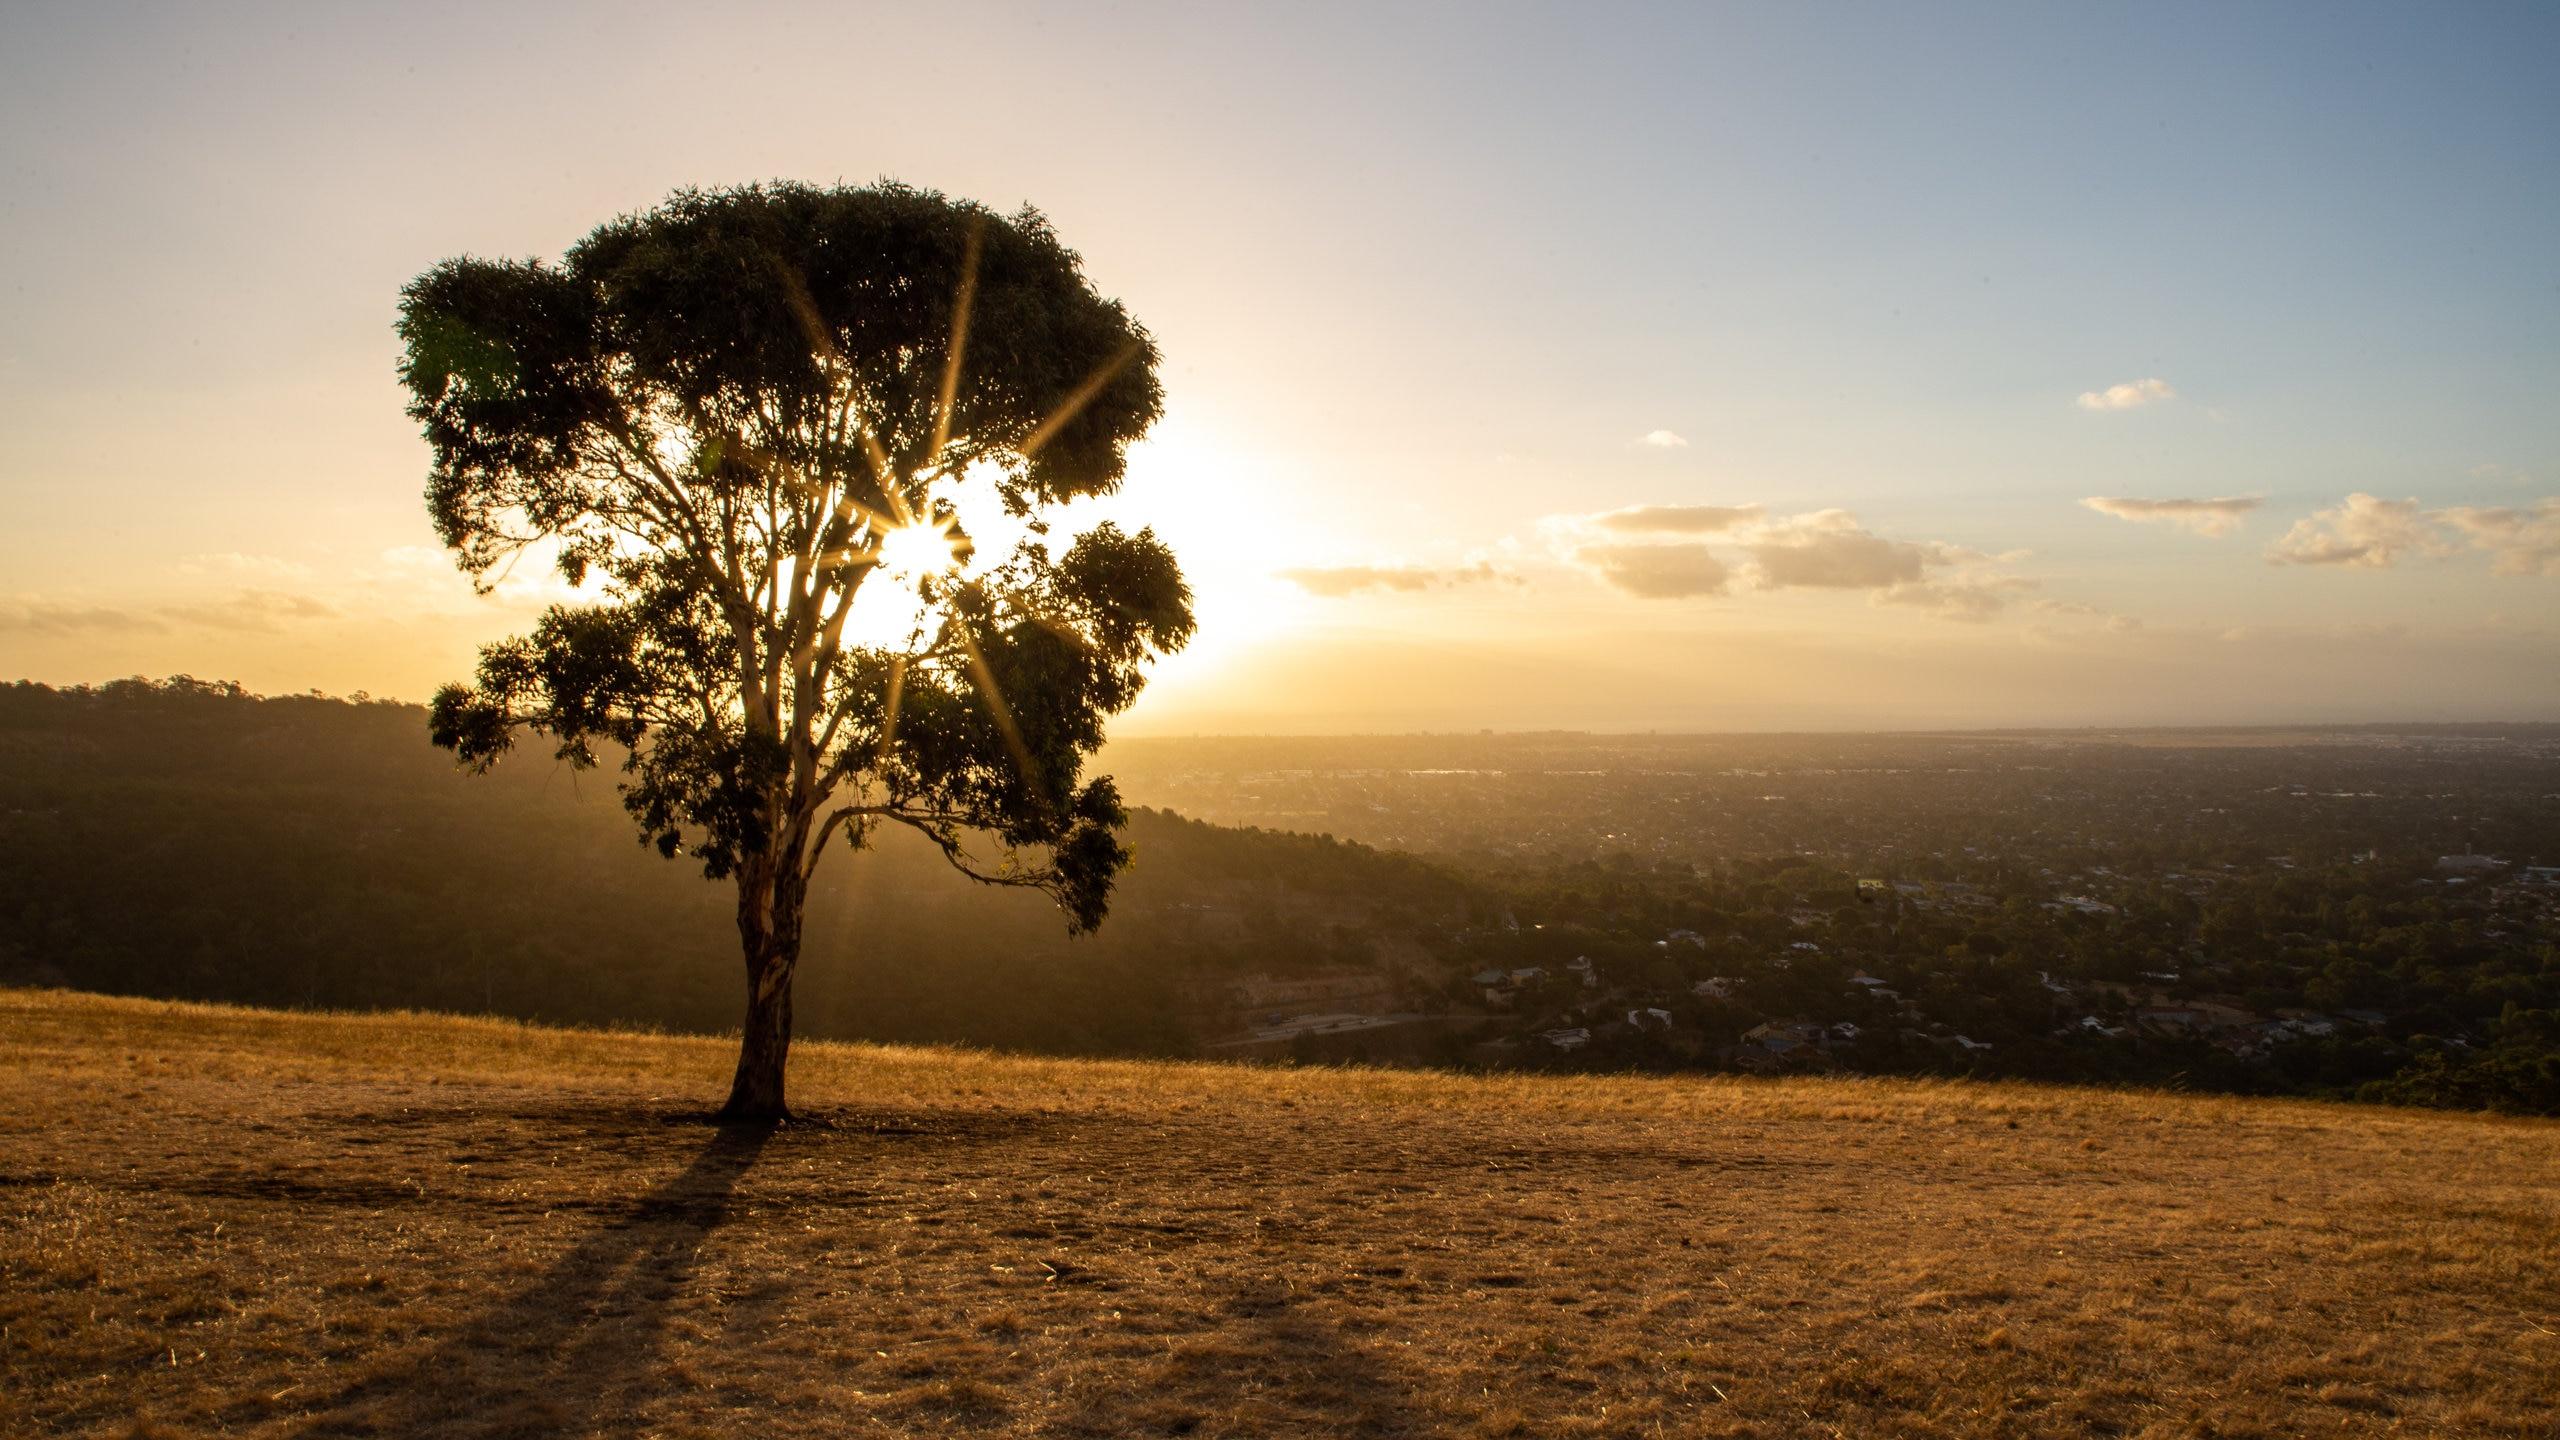 Mitcham, Adelaide, South Australia, Australia